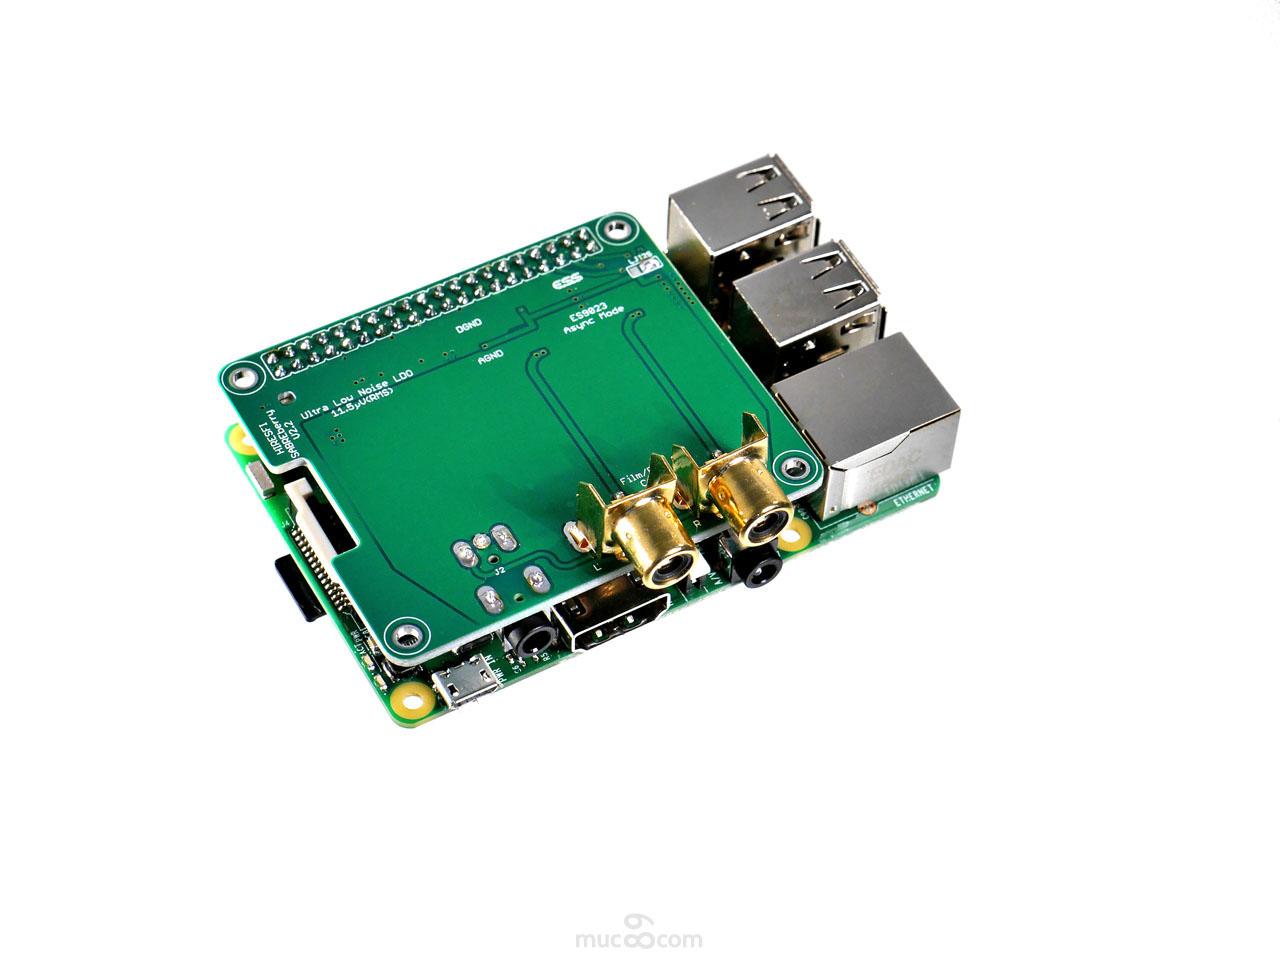 SABREberry ES9023 Flip-Chip